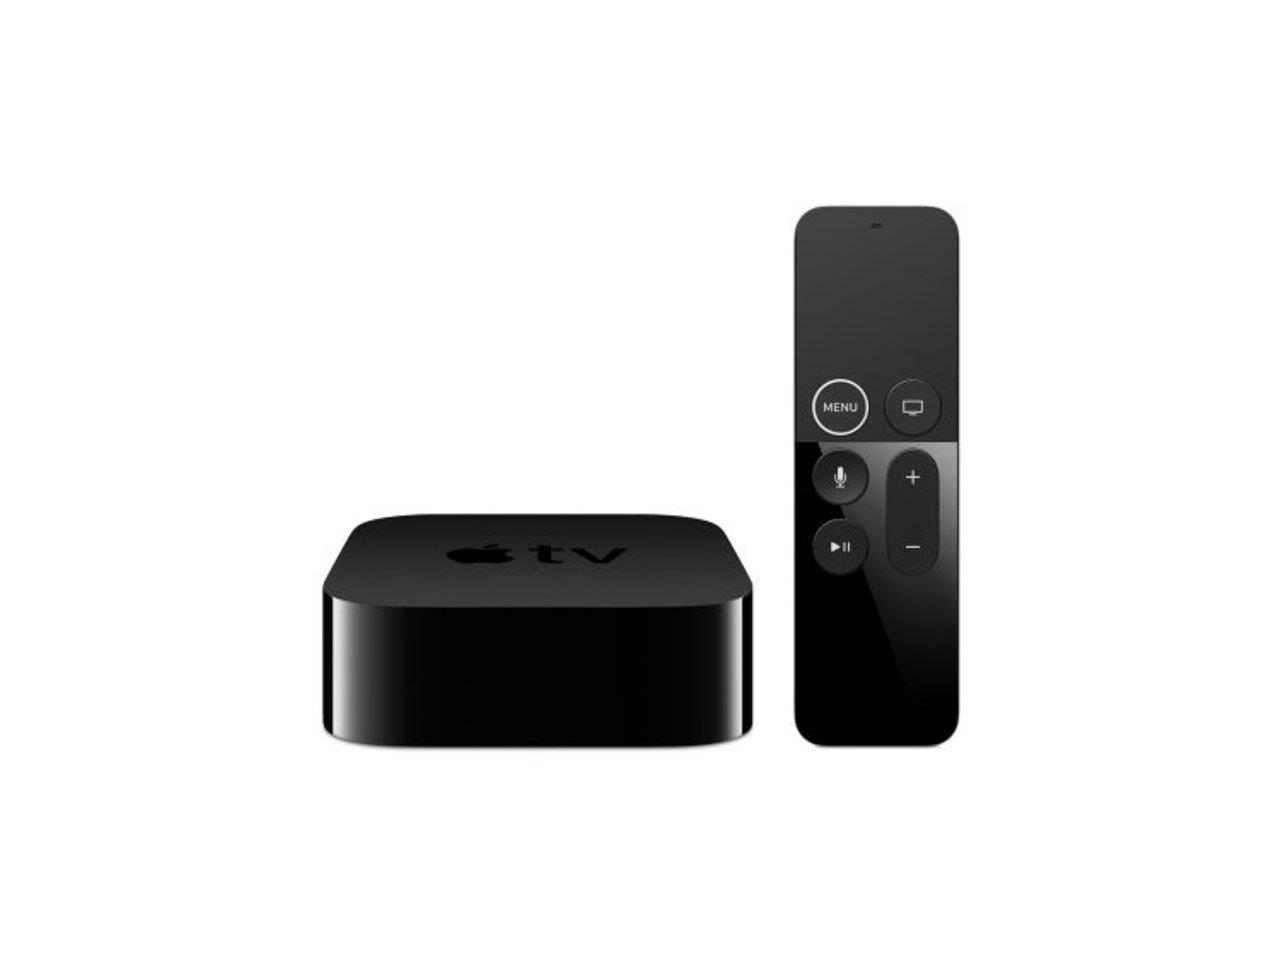 Apple TV 32GB 4K HDR Media Streamer - Black (MQD22LL/A